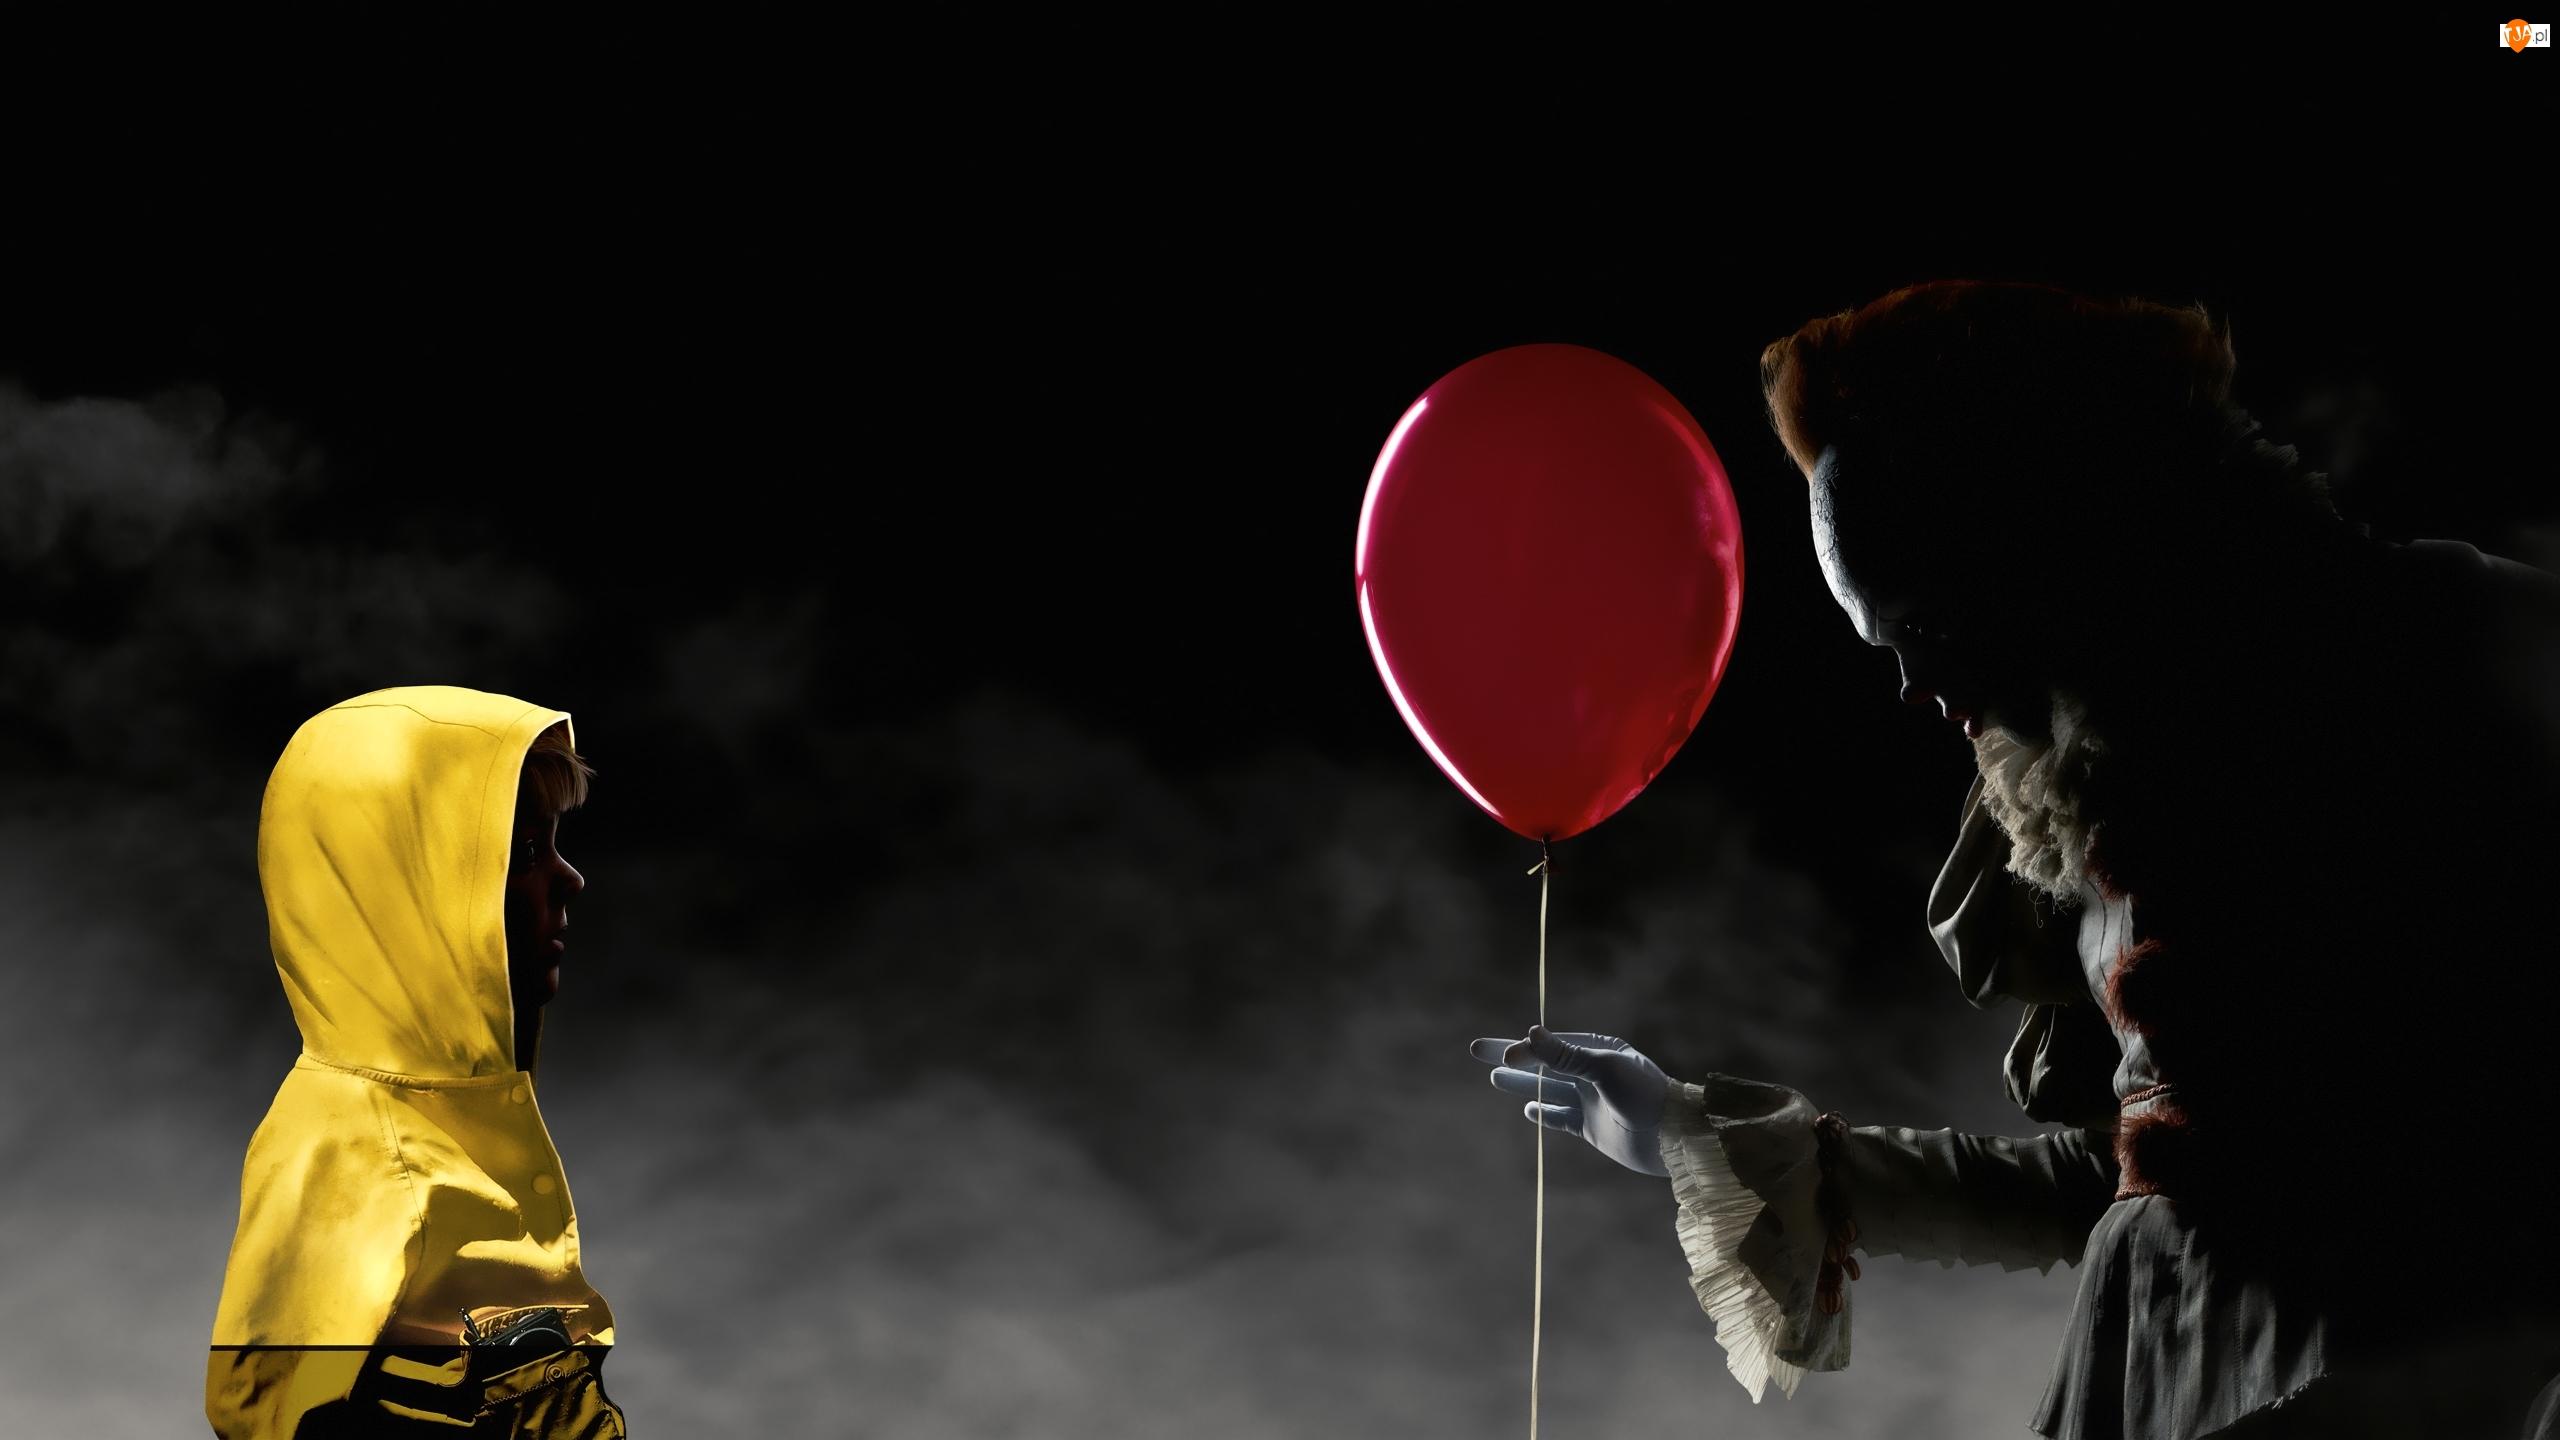 To, Film, Klaun Pennywise, Balon, It, Dziecko